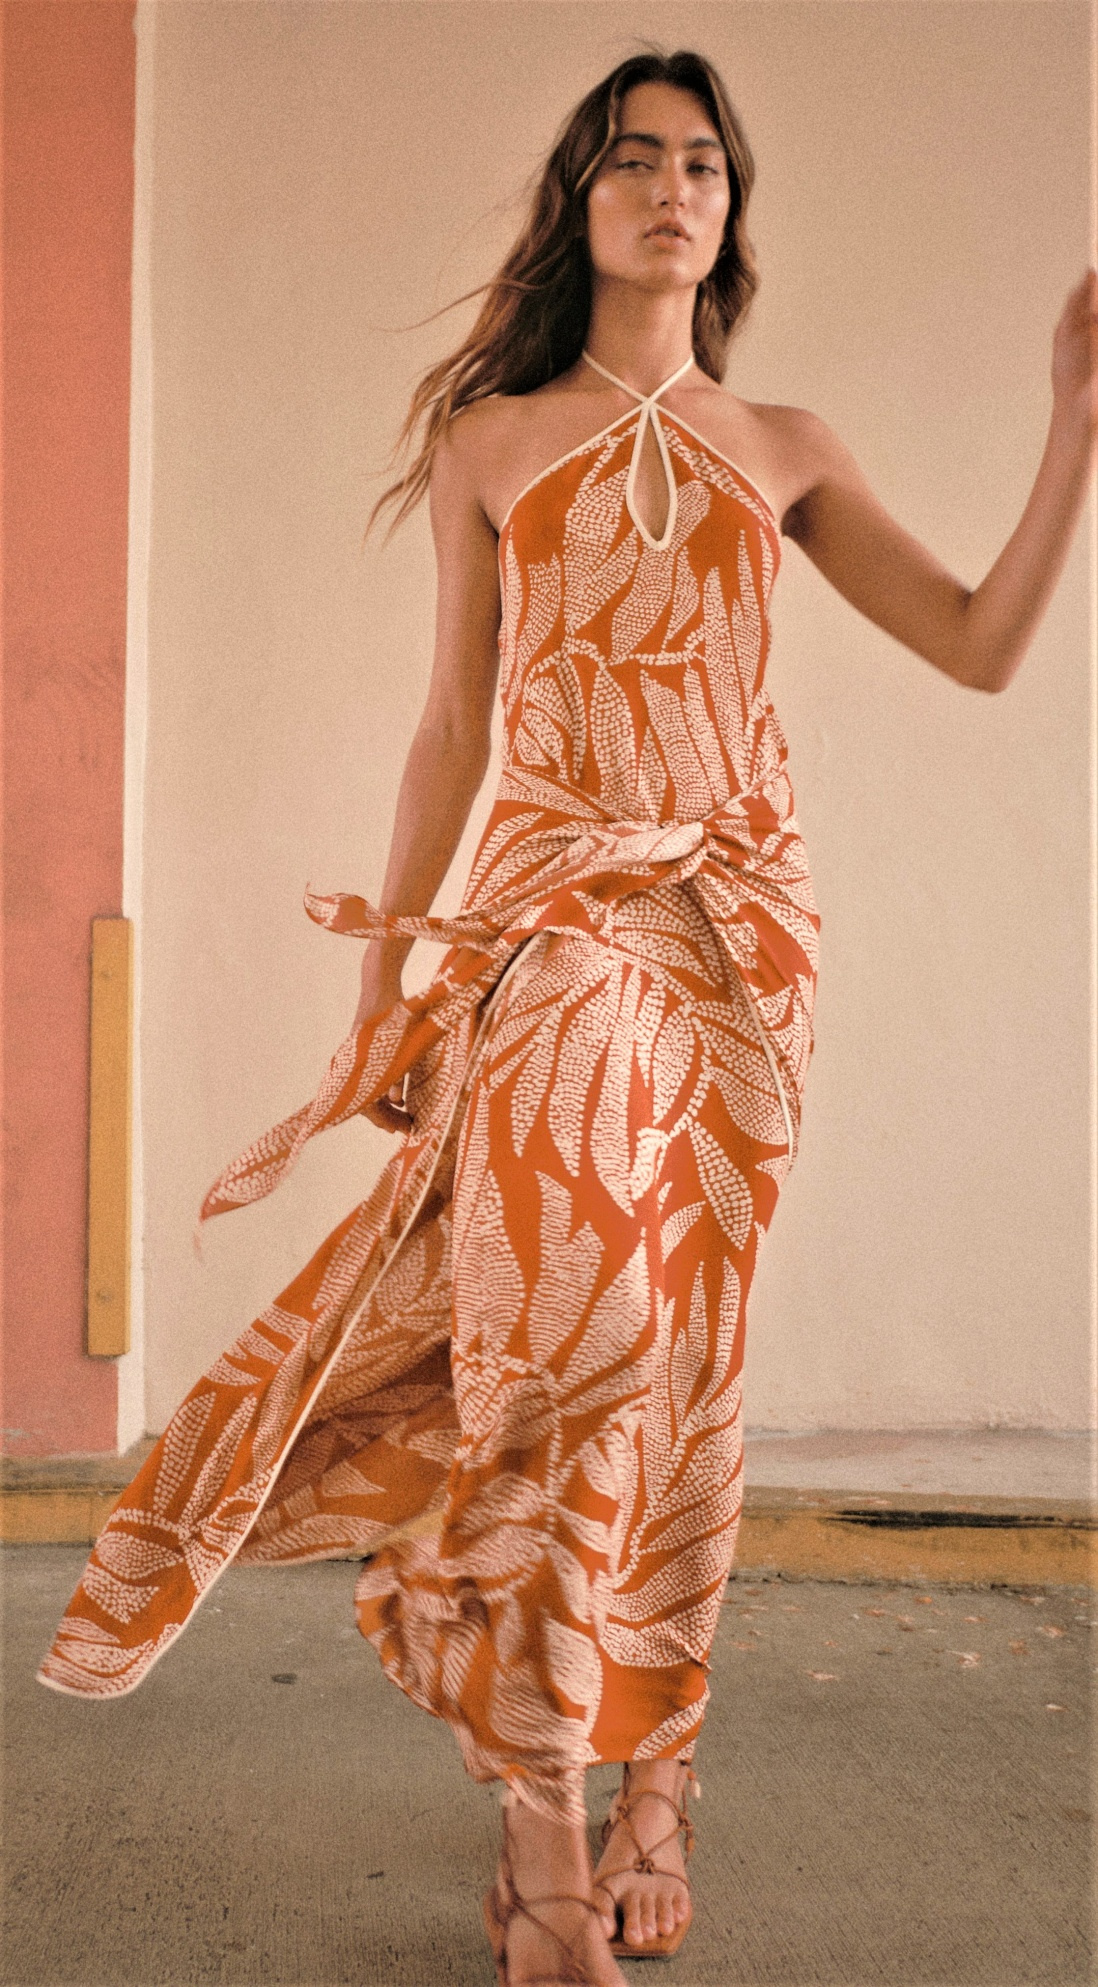 Johanna Ortiz resort 8-21 orange wht dress cropped.jpg